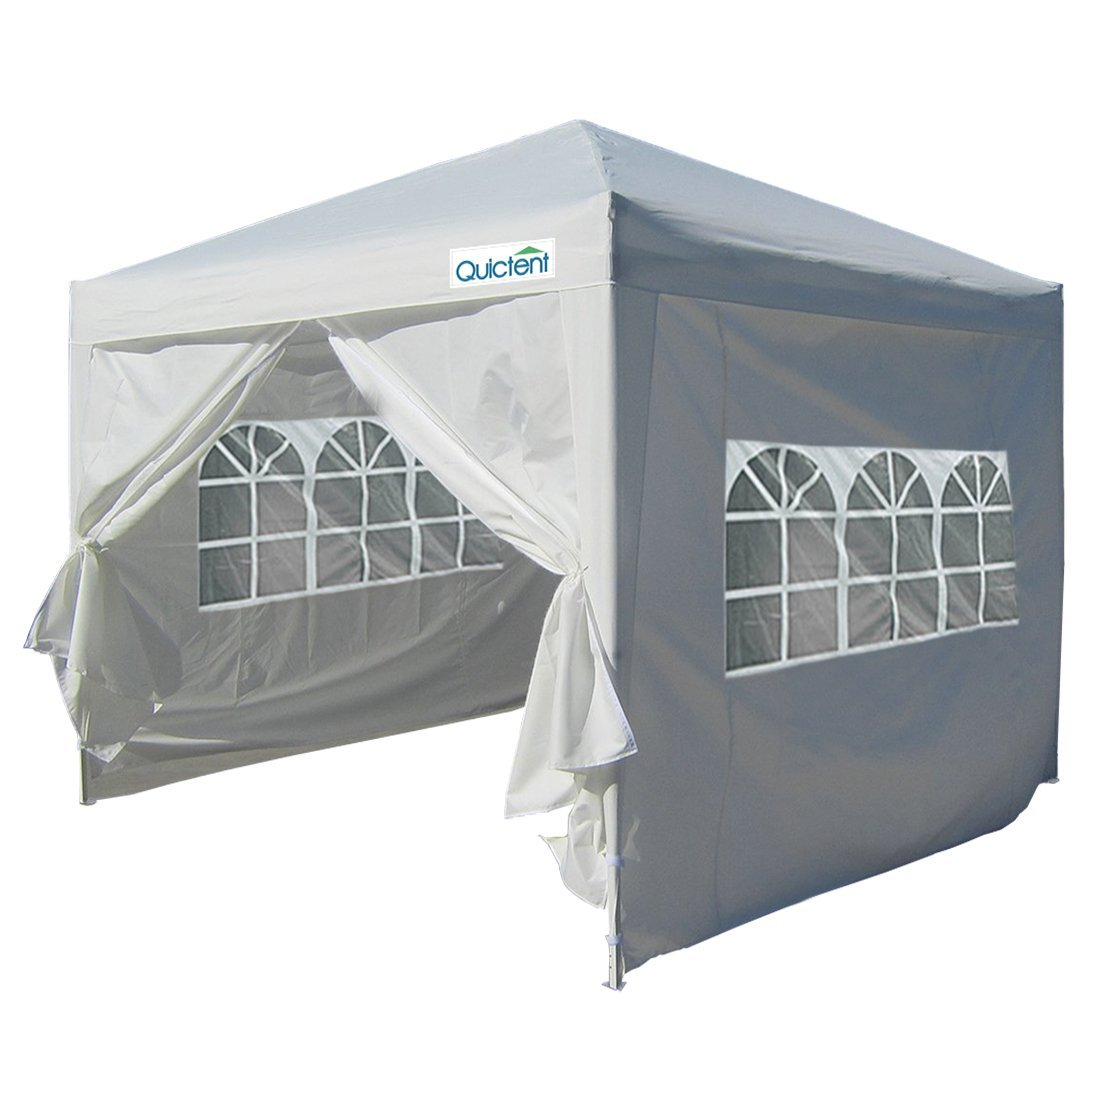 Quictent Silvox Waterproof 8x8' EZ Pop Up Canopy Commerci...